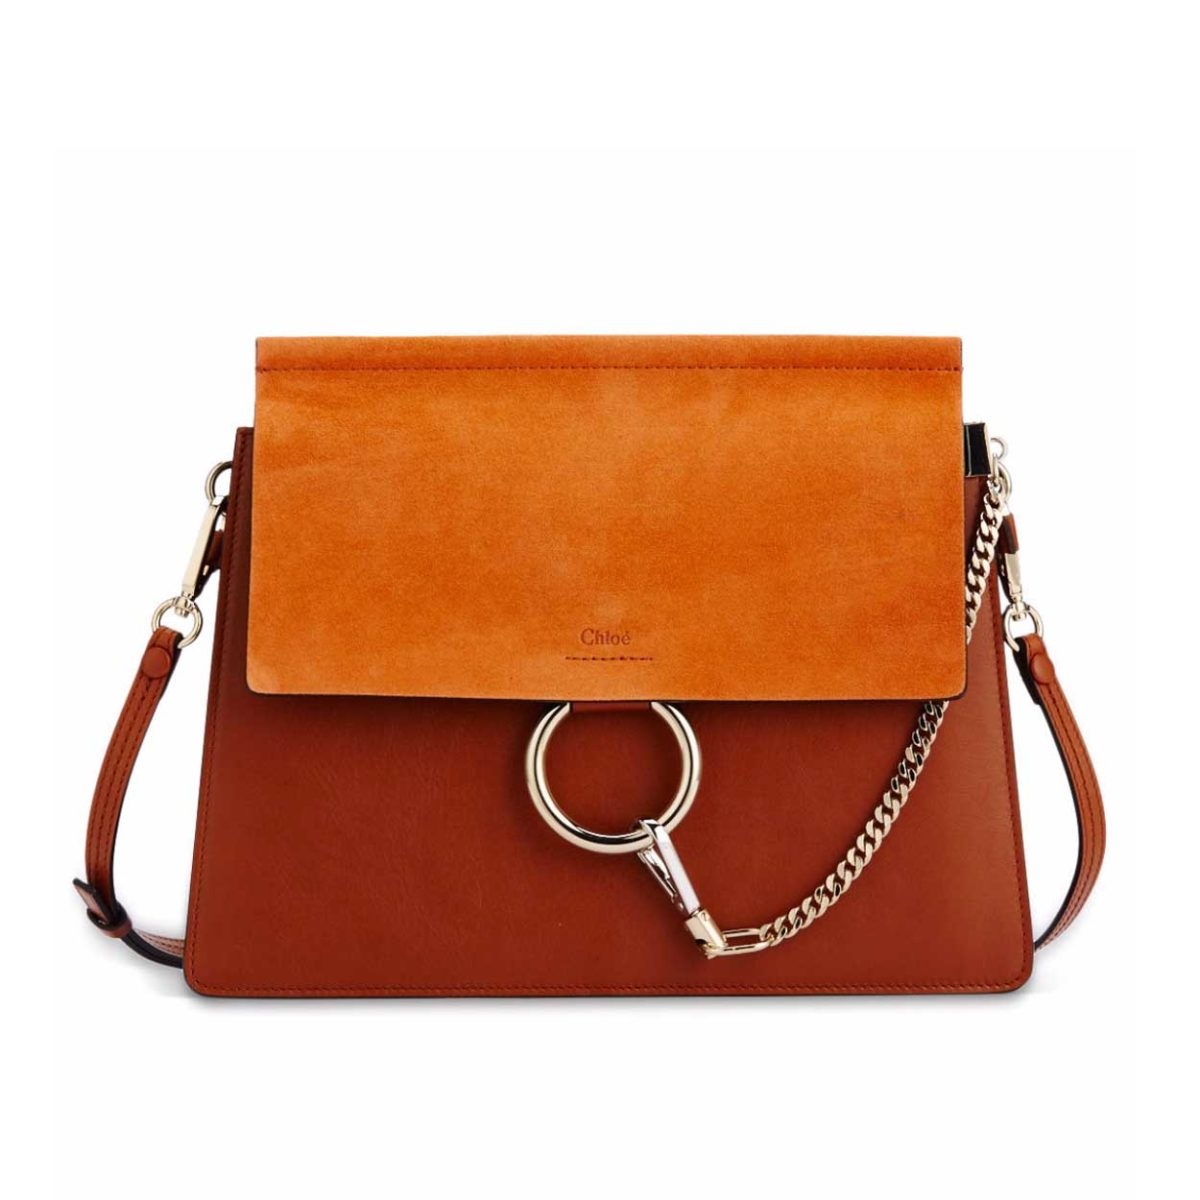 bbcc337d047 CHLOE Suede & Leather Faye Shoulder Bag Medium - NEW | Luxity